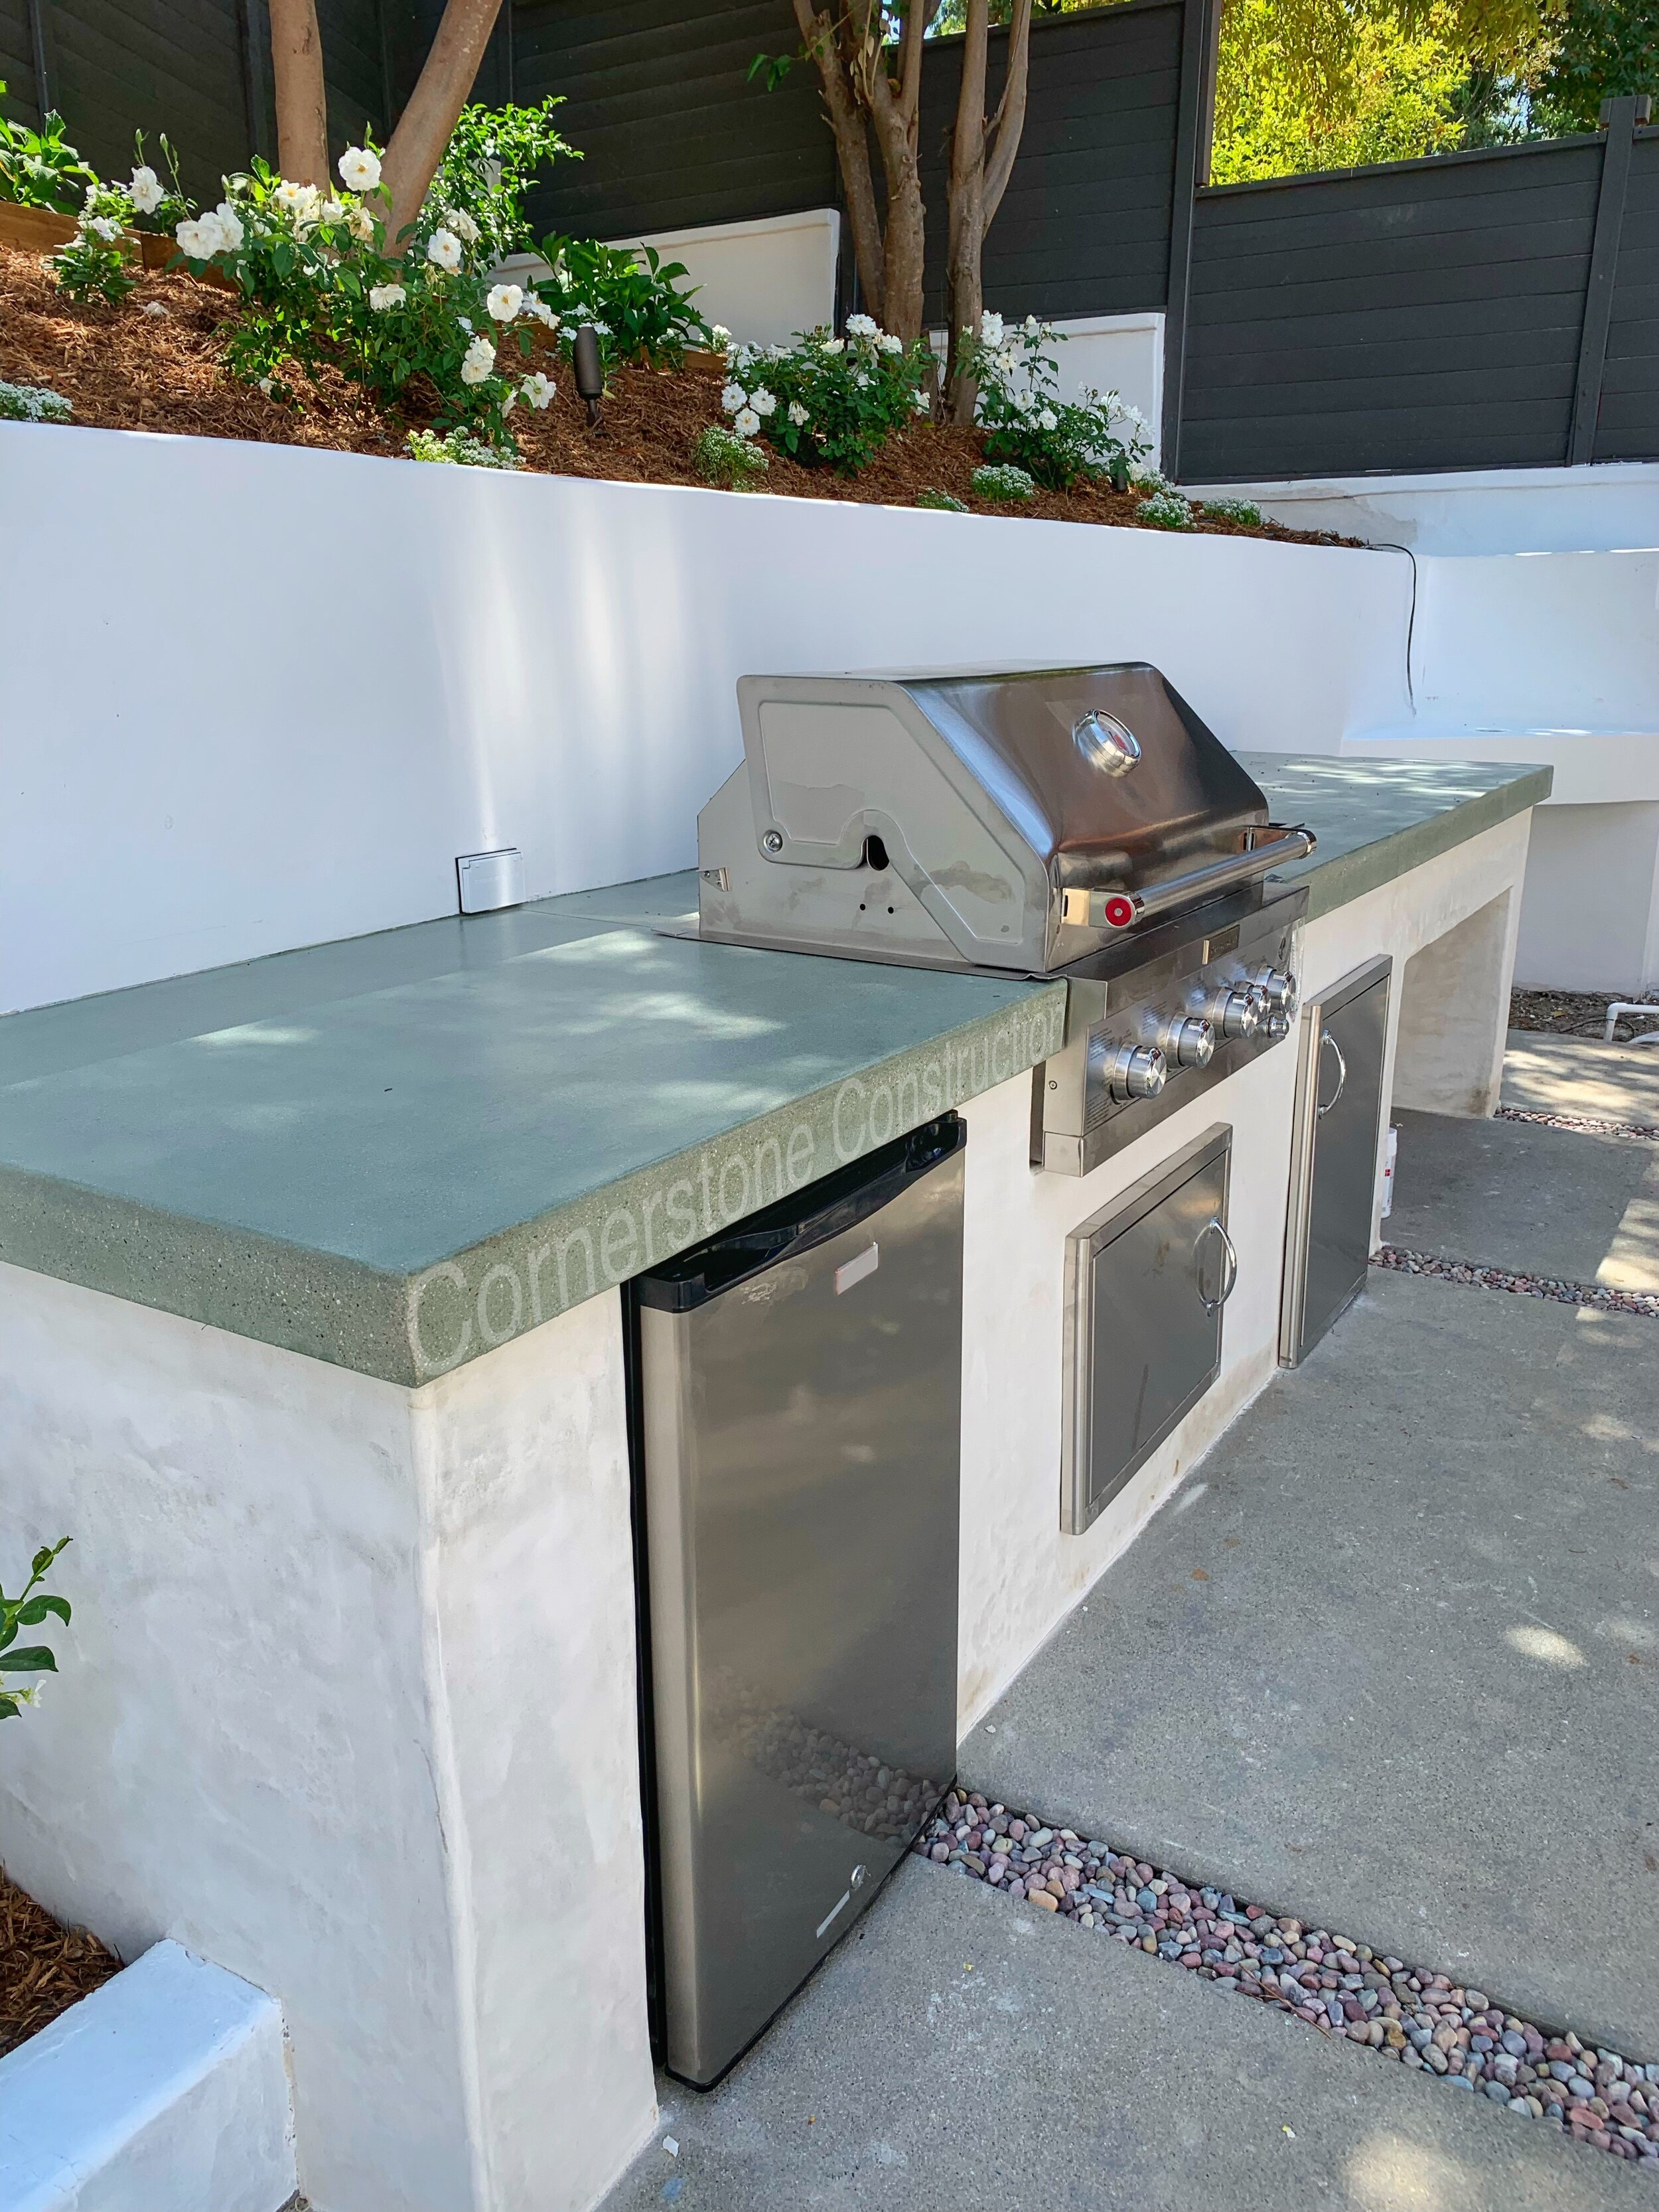 basic build-in grill and mini-fridge in backyard